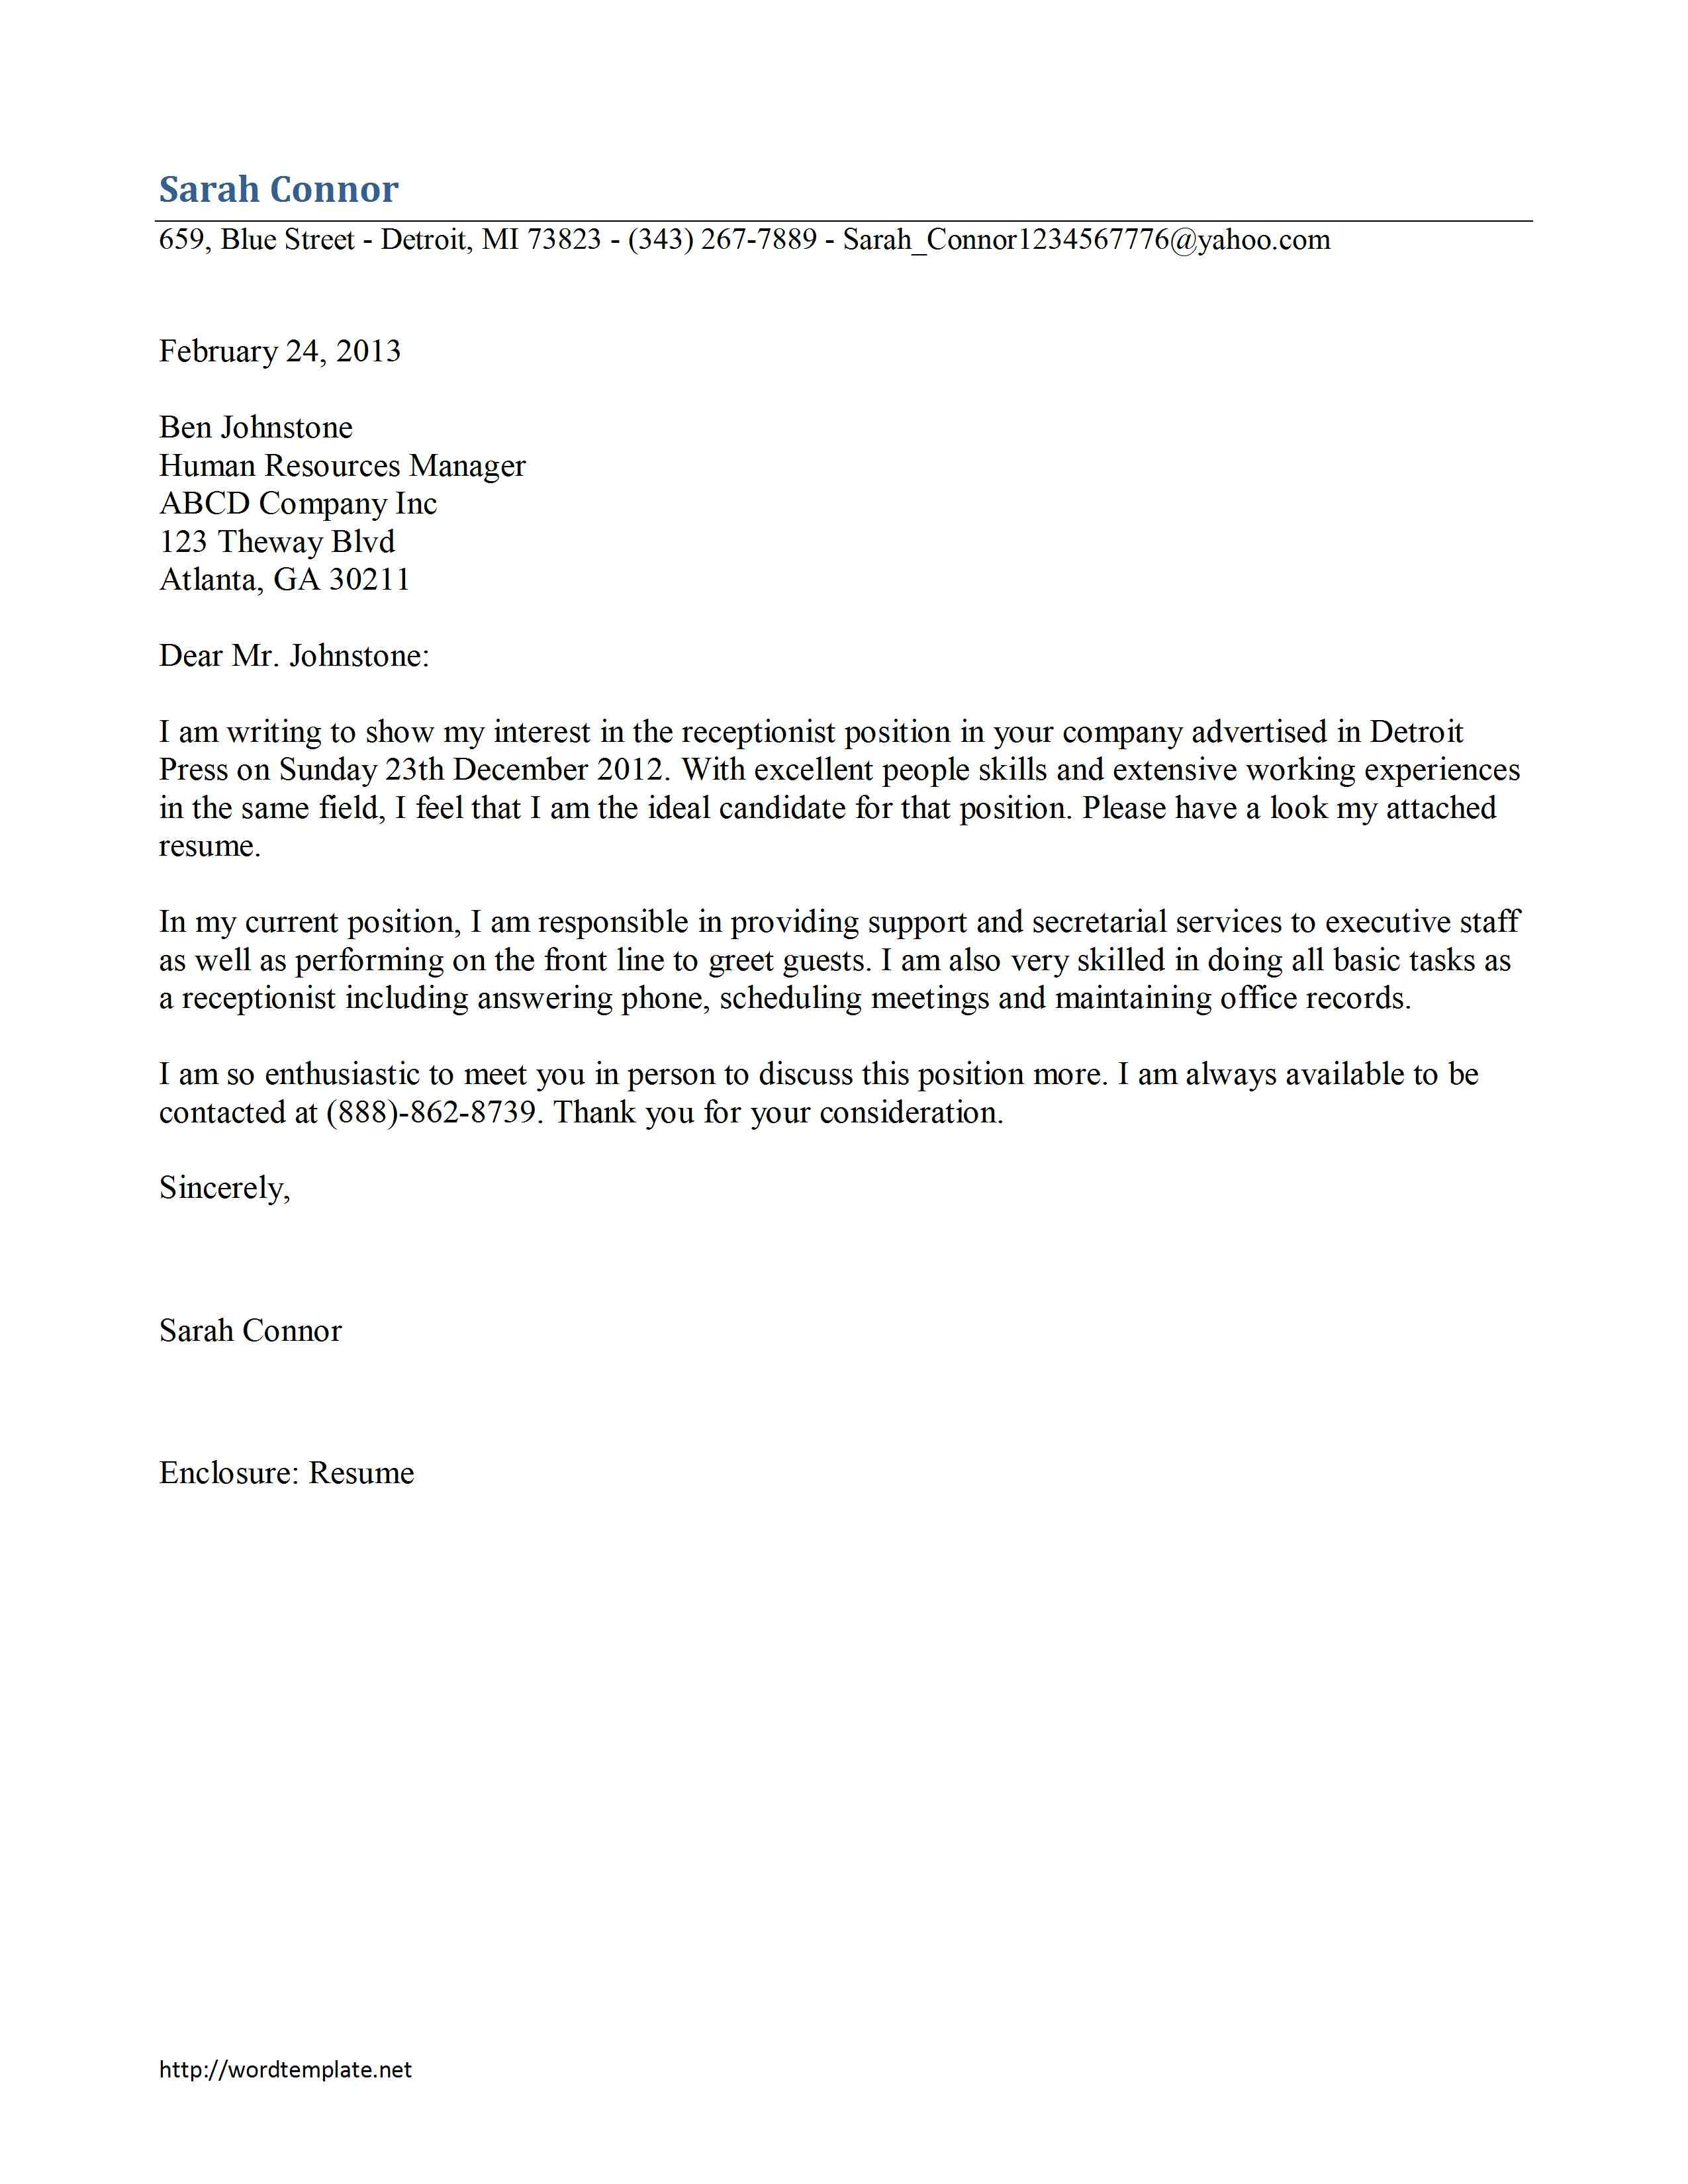 sample reception cover letter